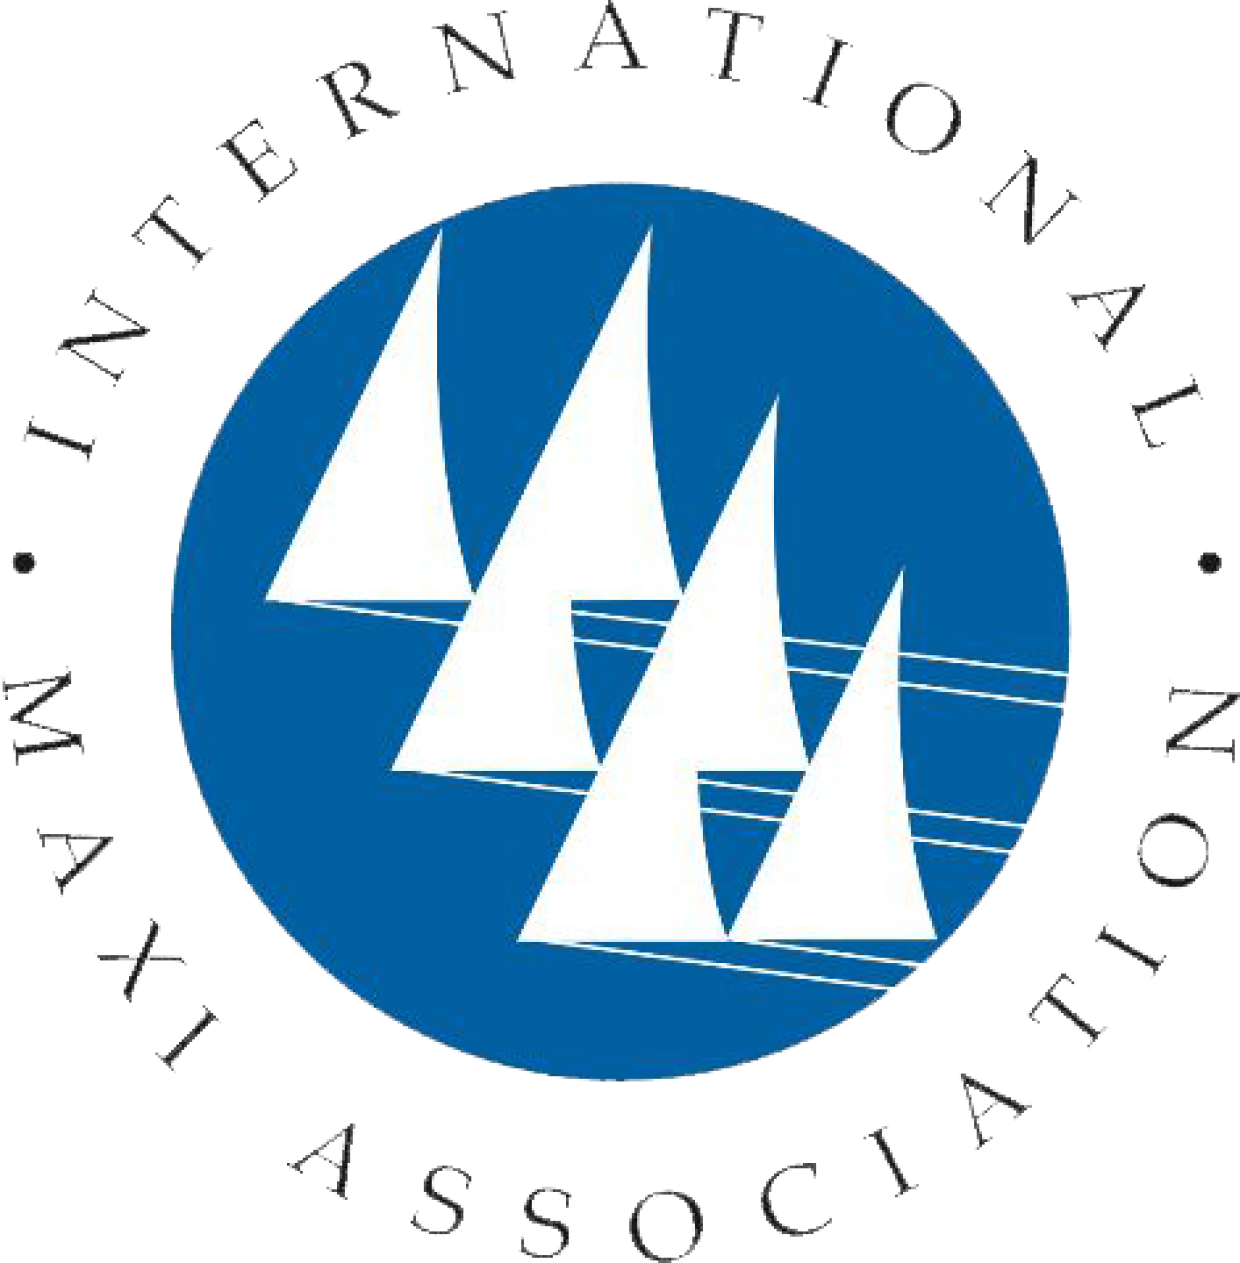 International Maxi Association